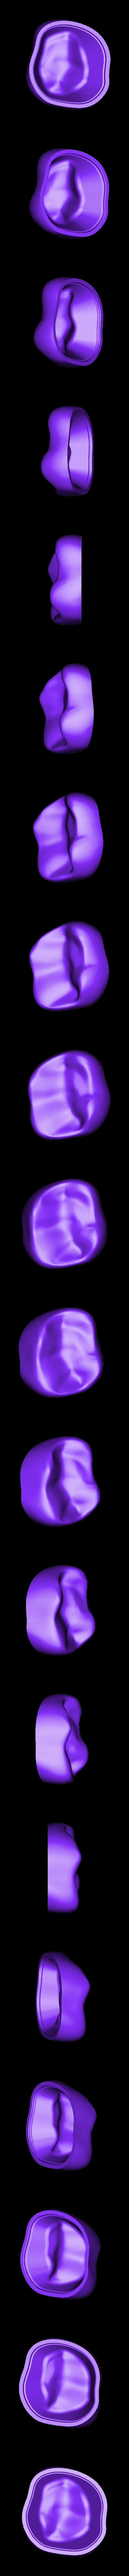 Up.stl Download free STL file Teeth Box • 3D print object, omni-moulage